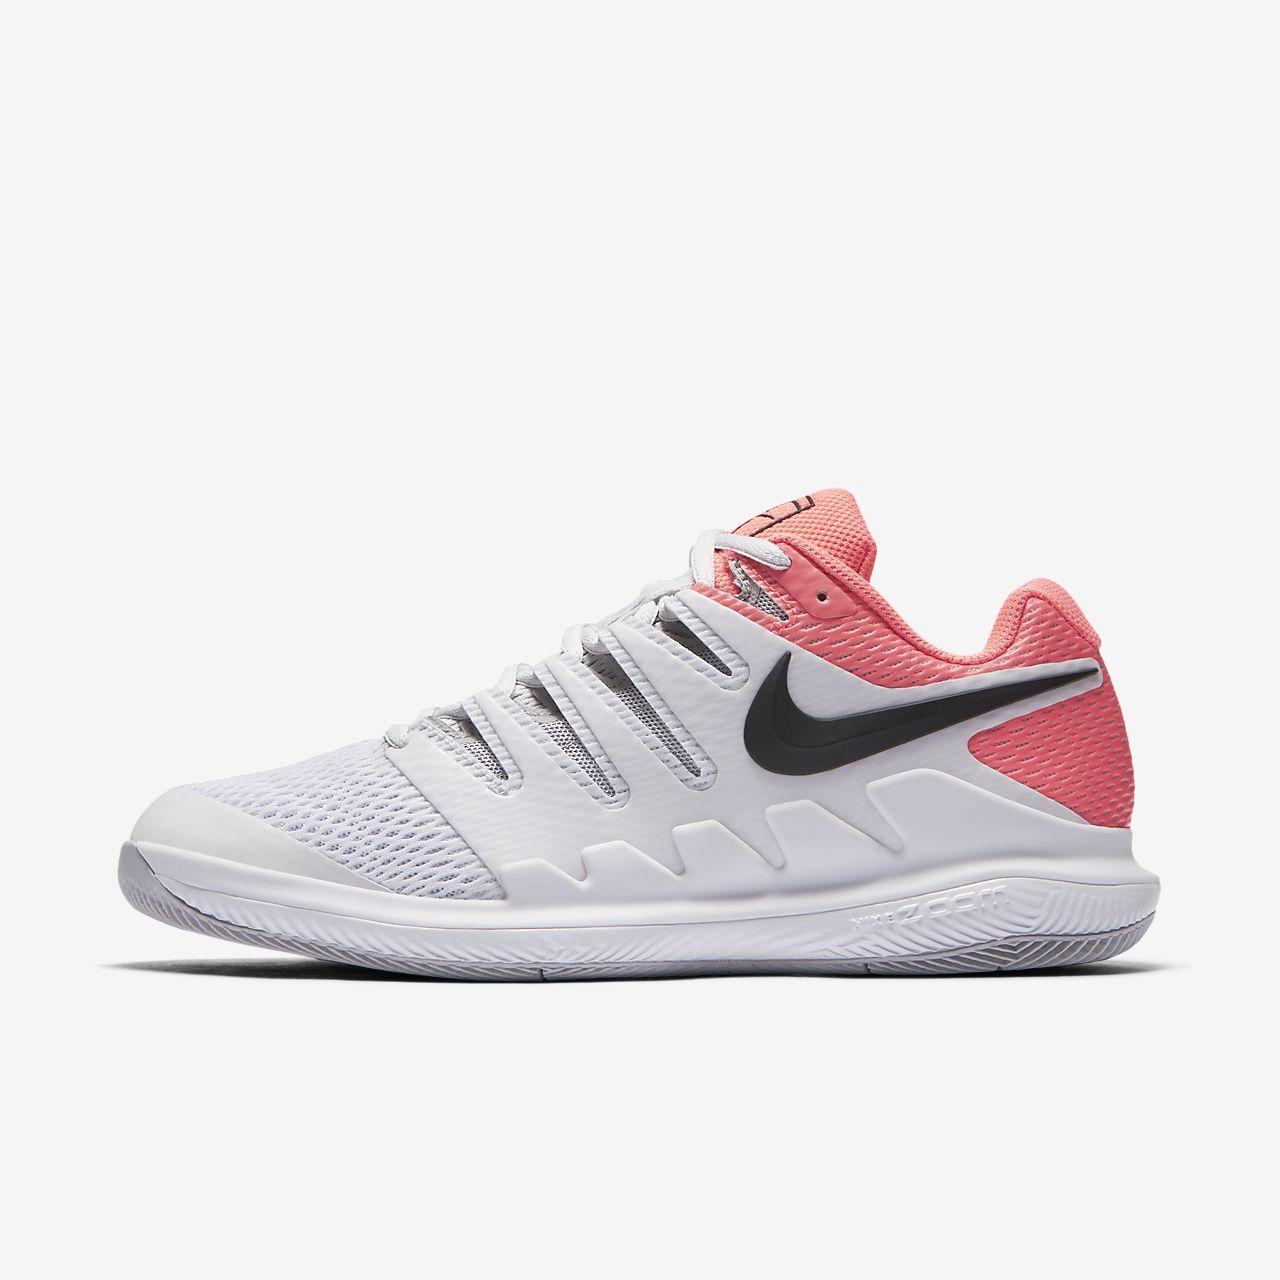 Nike - Air Zoom Vapor X Femmes Chaussure de tennis (gris/rosa) - EU 39 - US 8 YbeVco